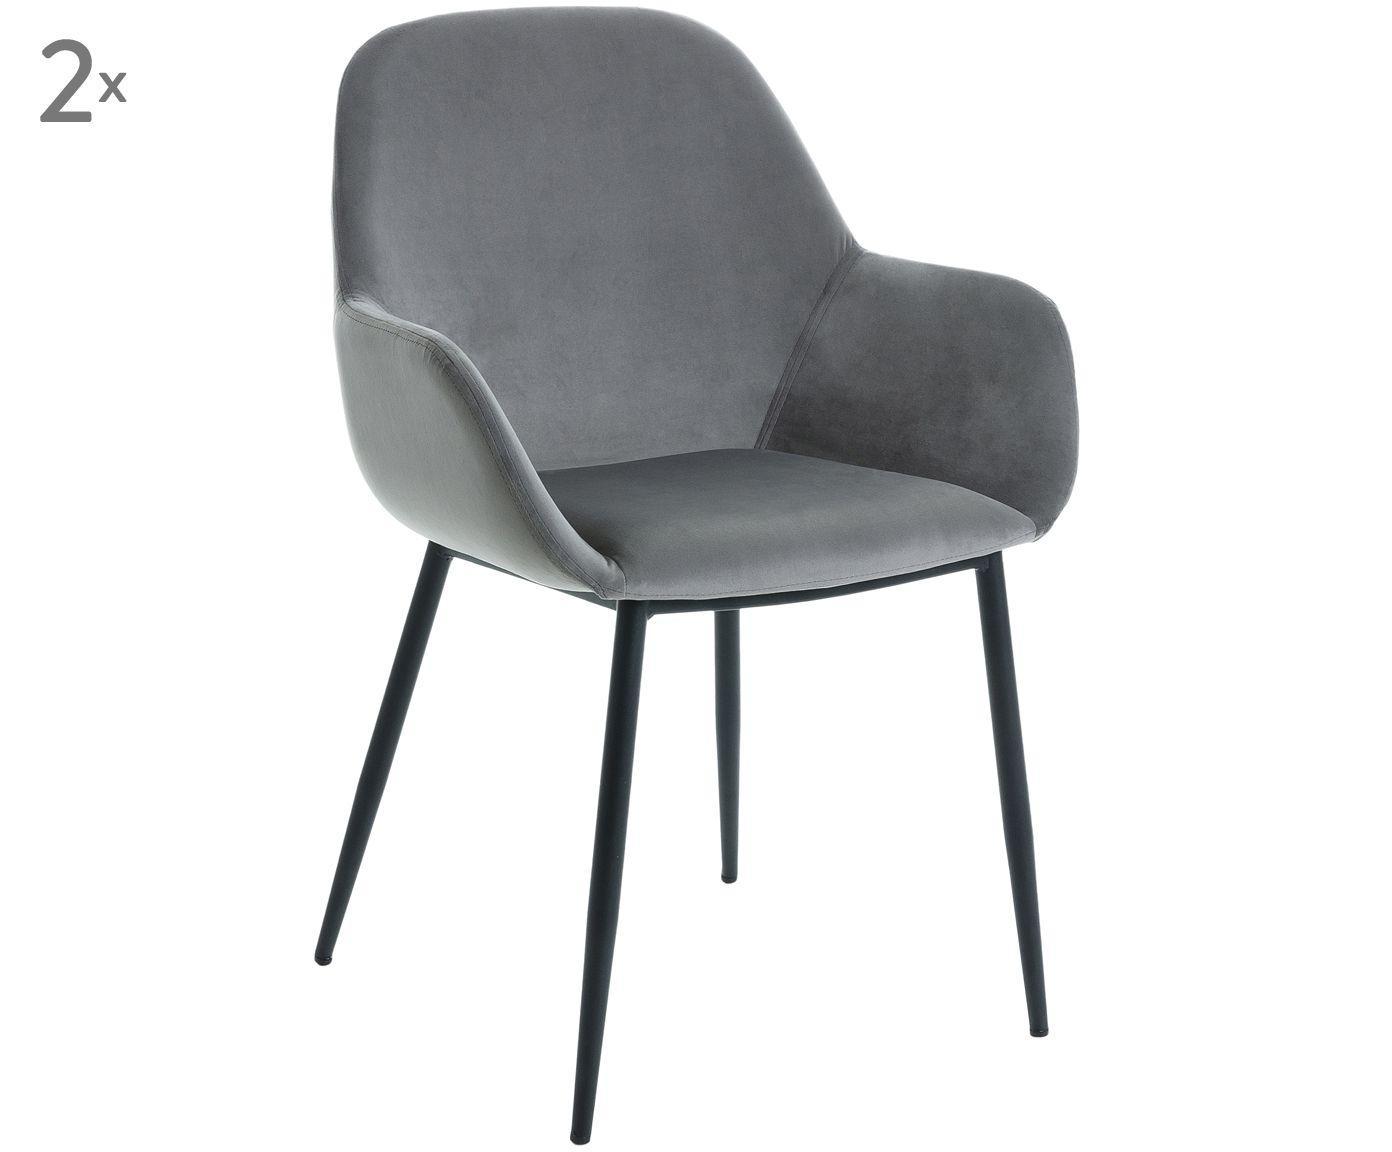 Samt Stuhl Mit Lehne